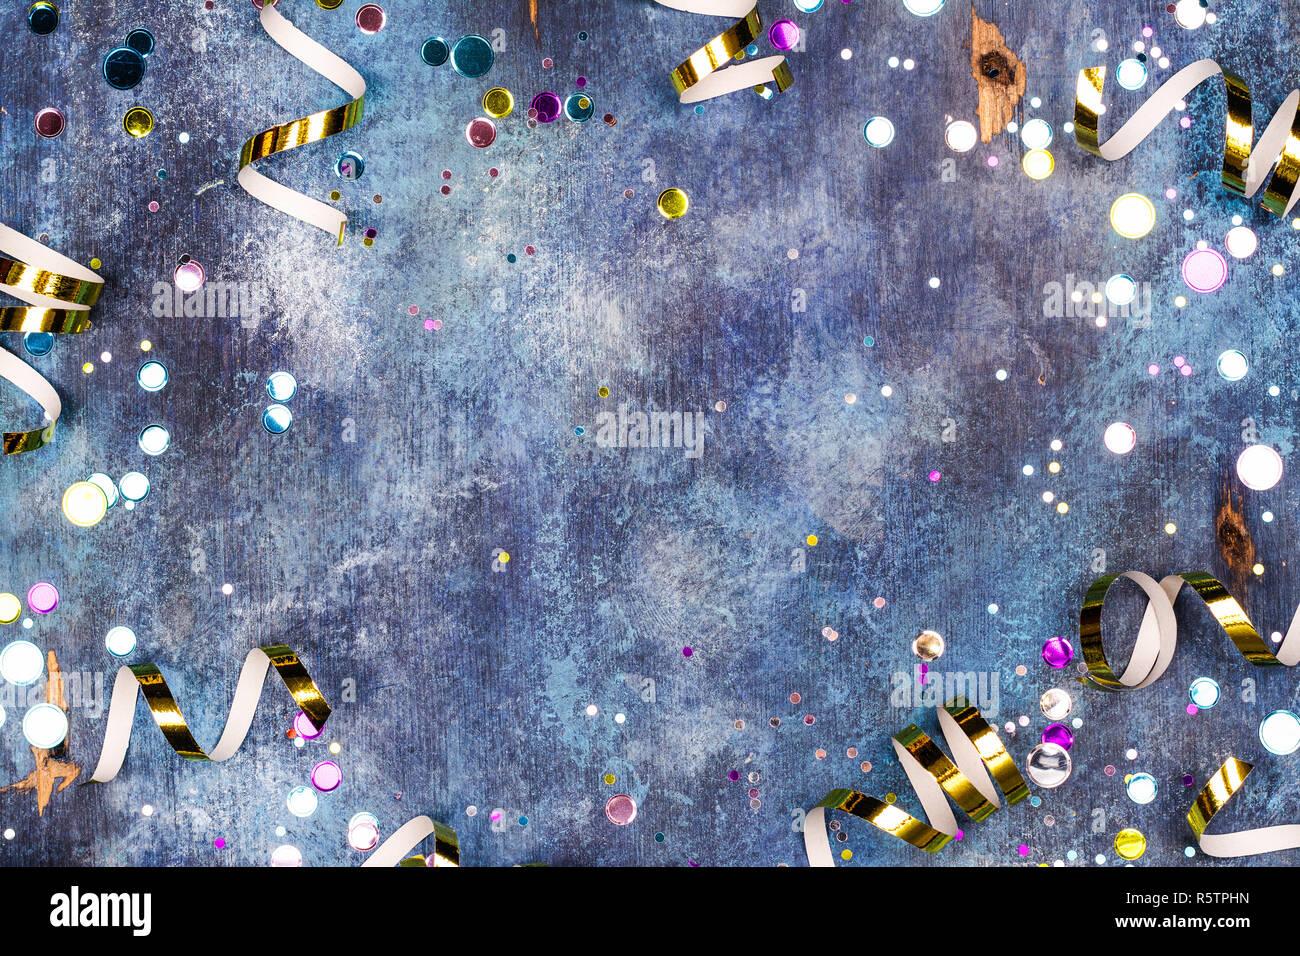 Karneval Dekor Stockfotos Karneval Dekor Bilder Alamy